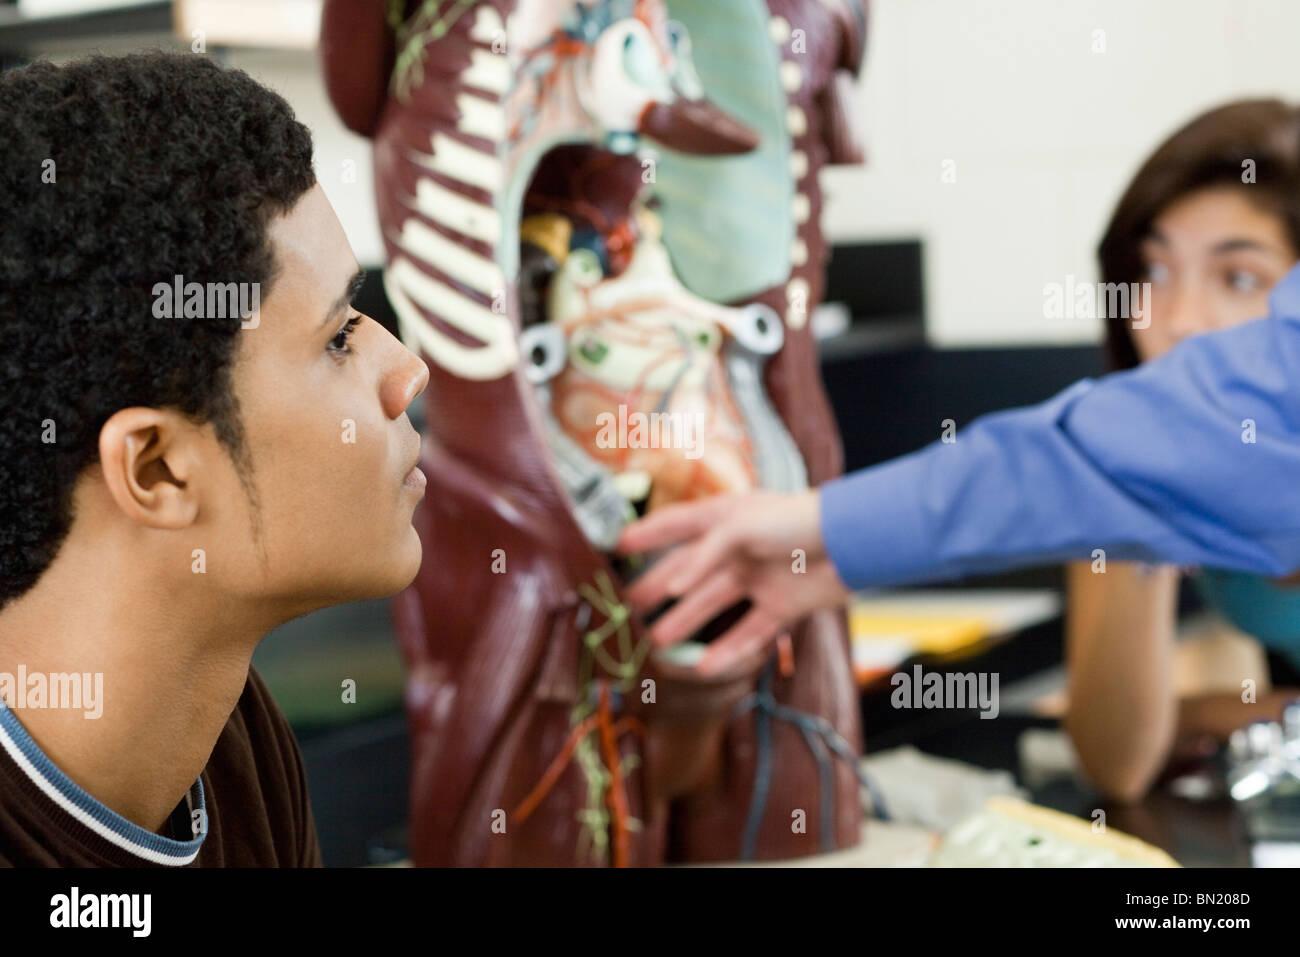 High school student learning anatomy - Stock Image